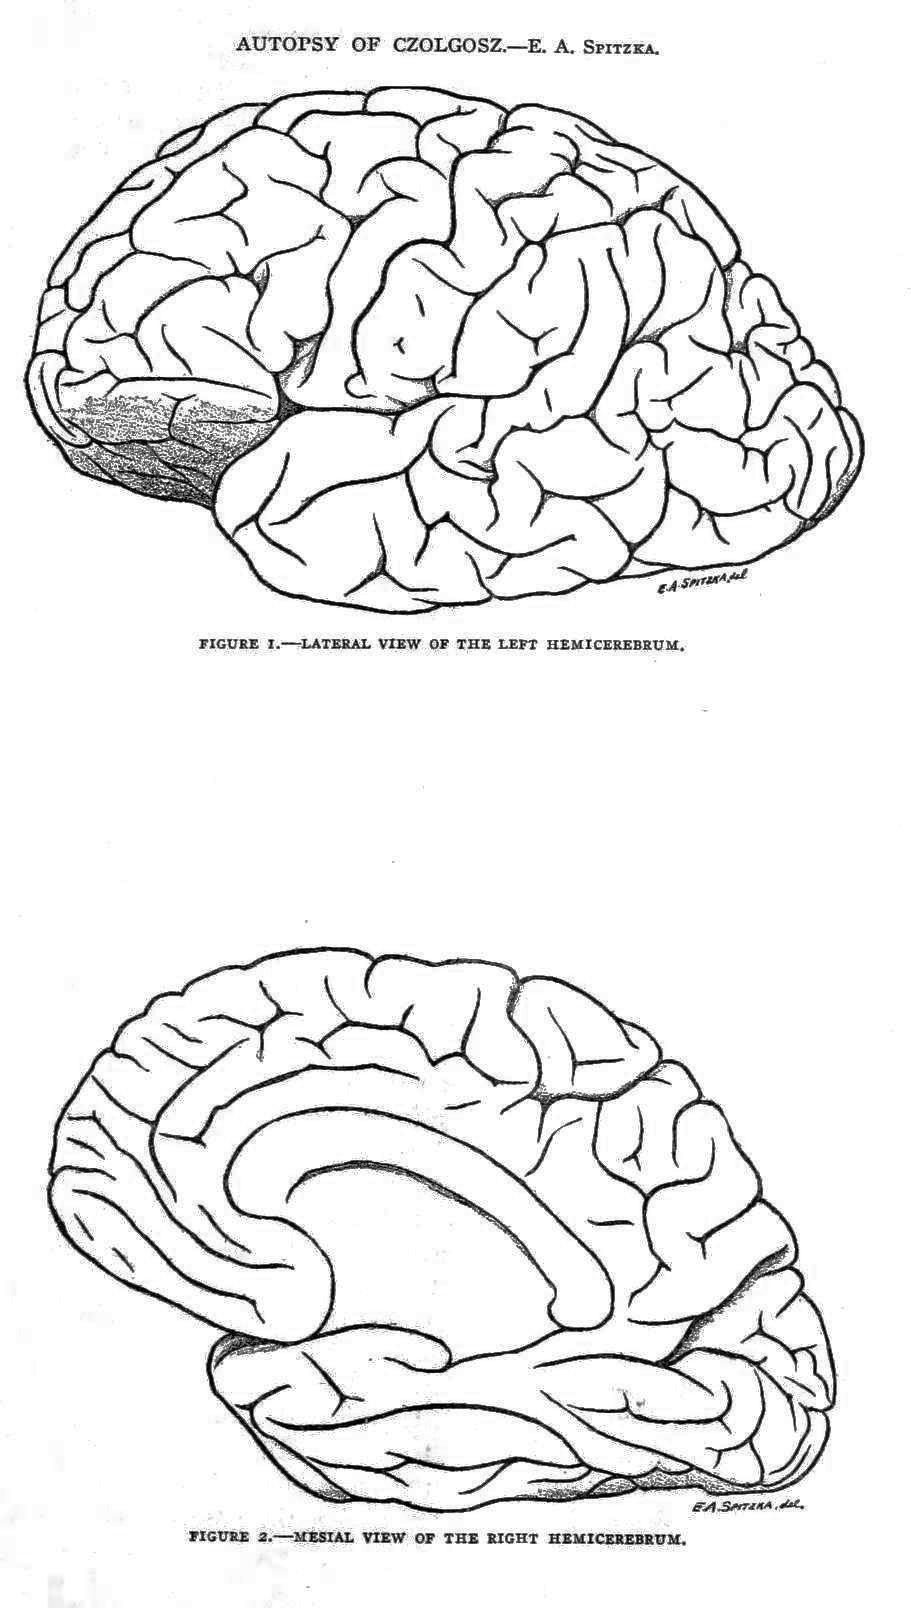 Autopsy drawings of brain of Leon Czolgosz